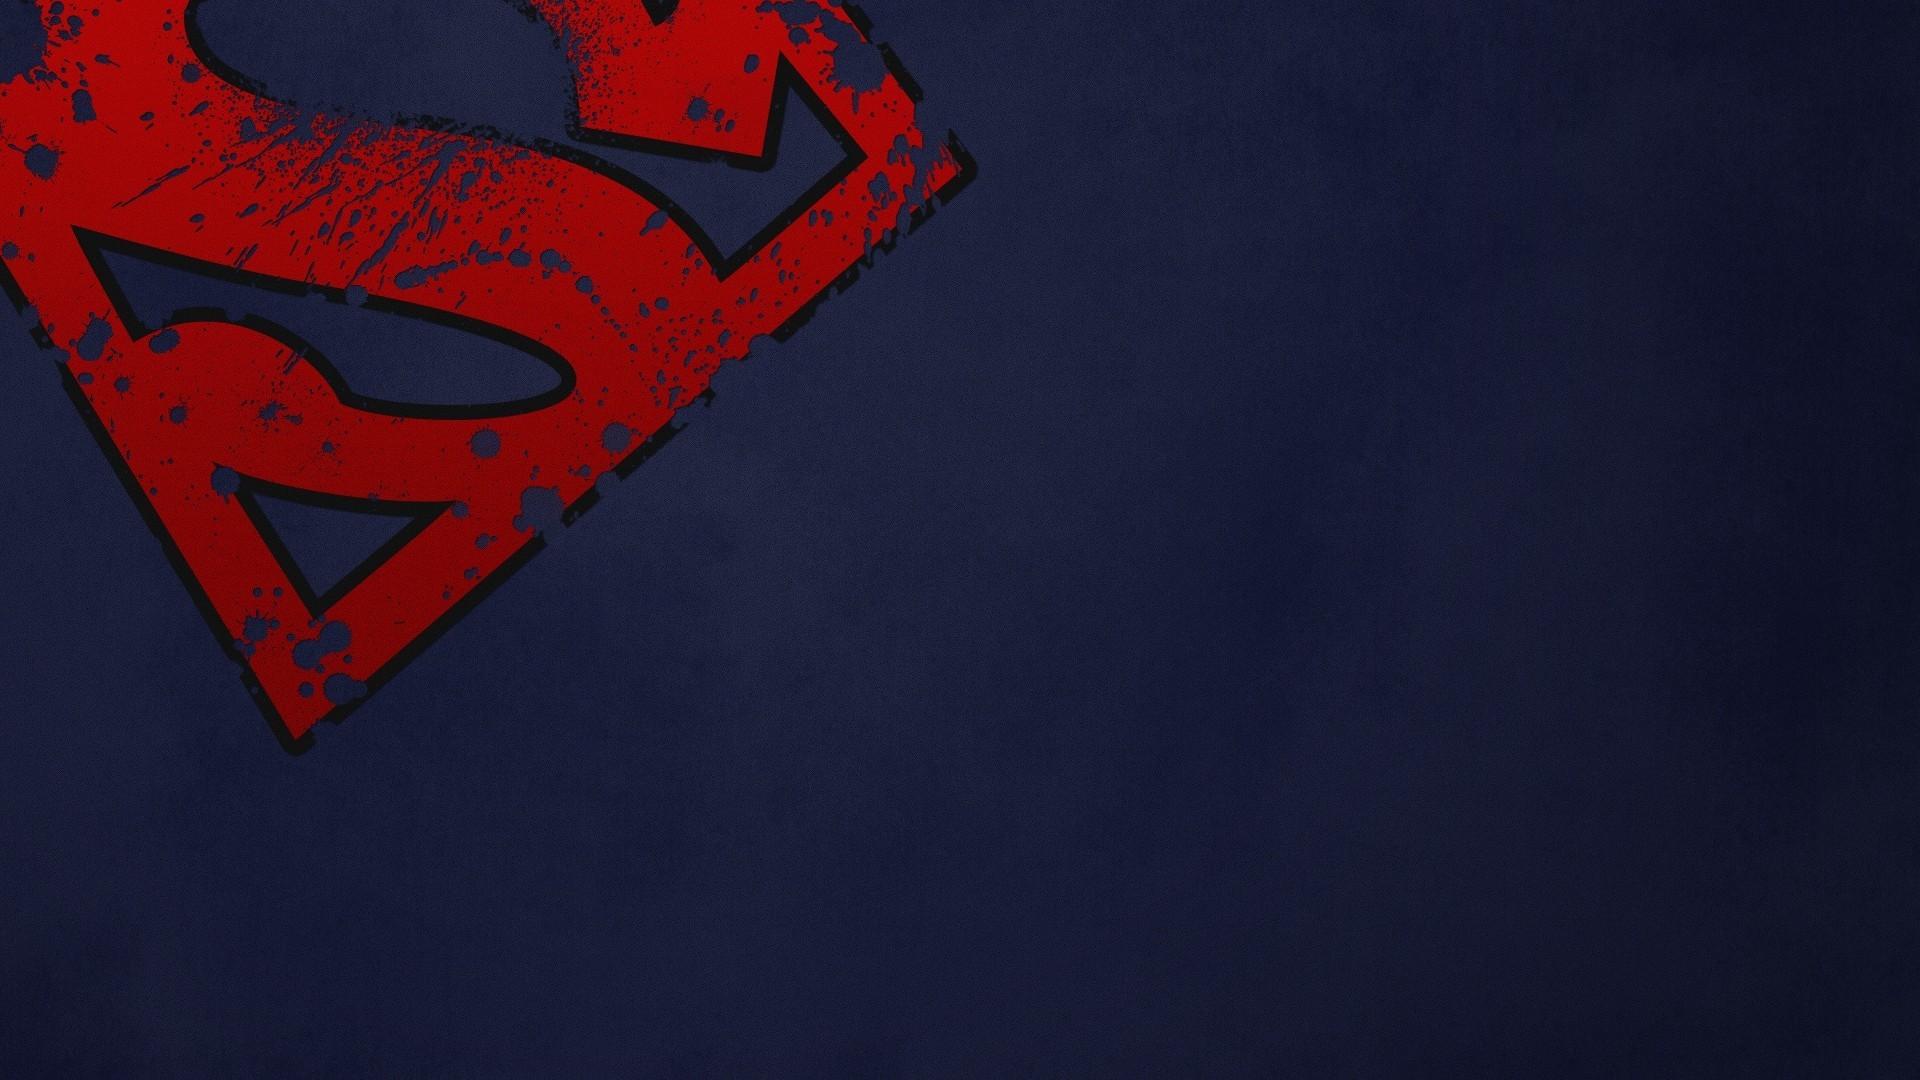 Superman logo wallpaper 63 images 1920x1200 superman logo wallpaper voltagebd Choice Image